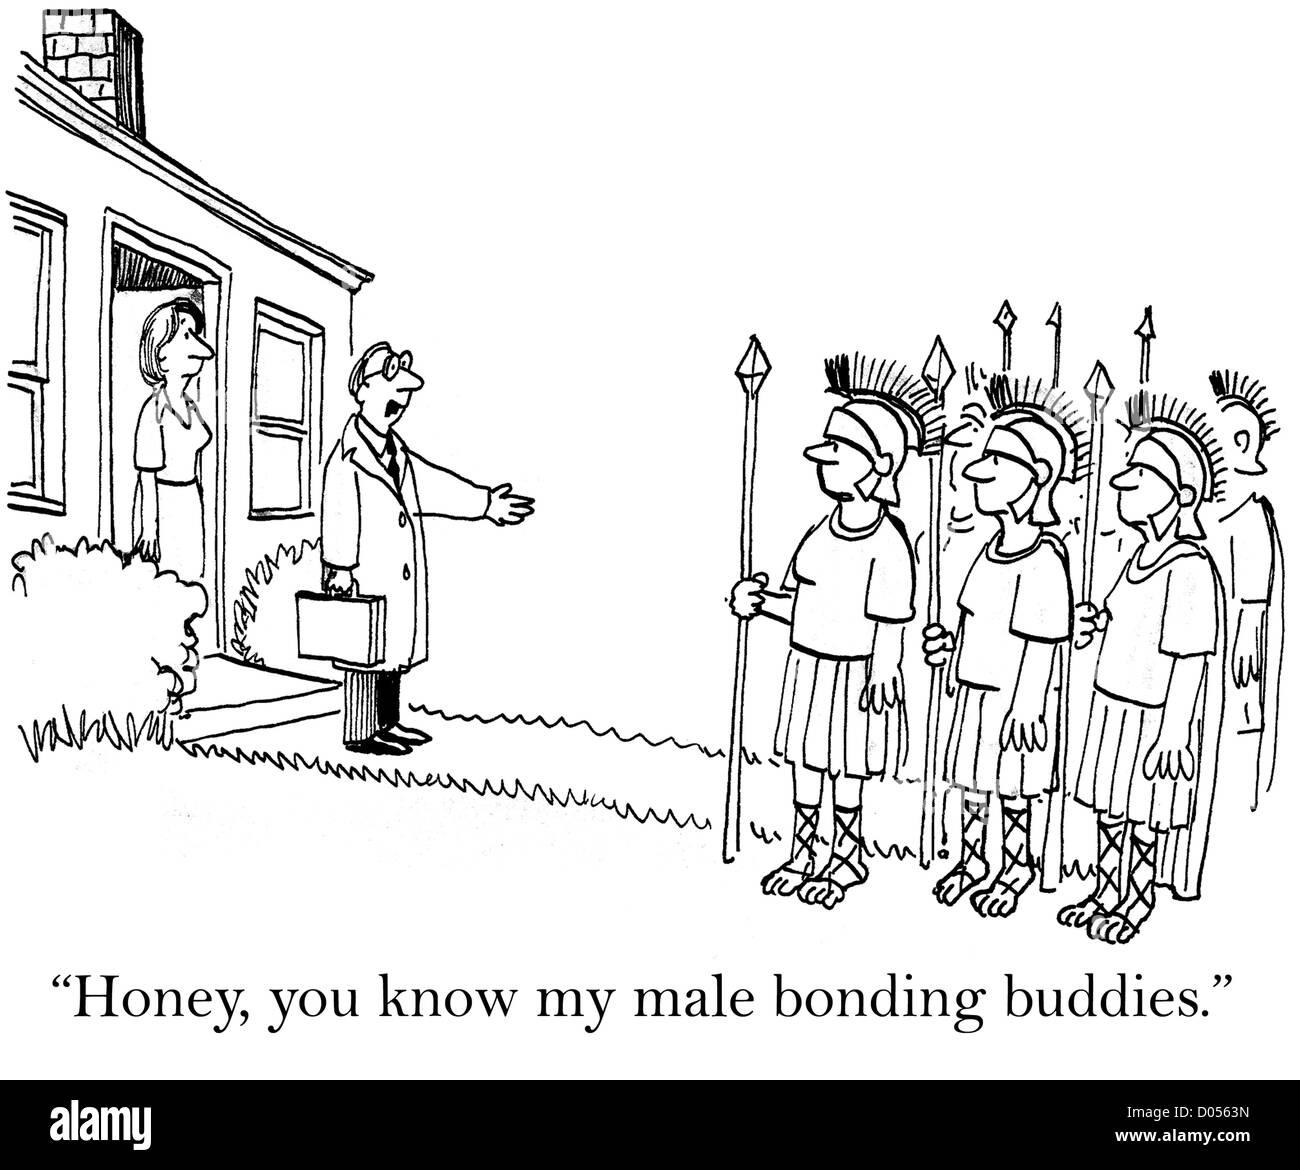 'Honey, you know my male bonding buddies.' - Stock Image